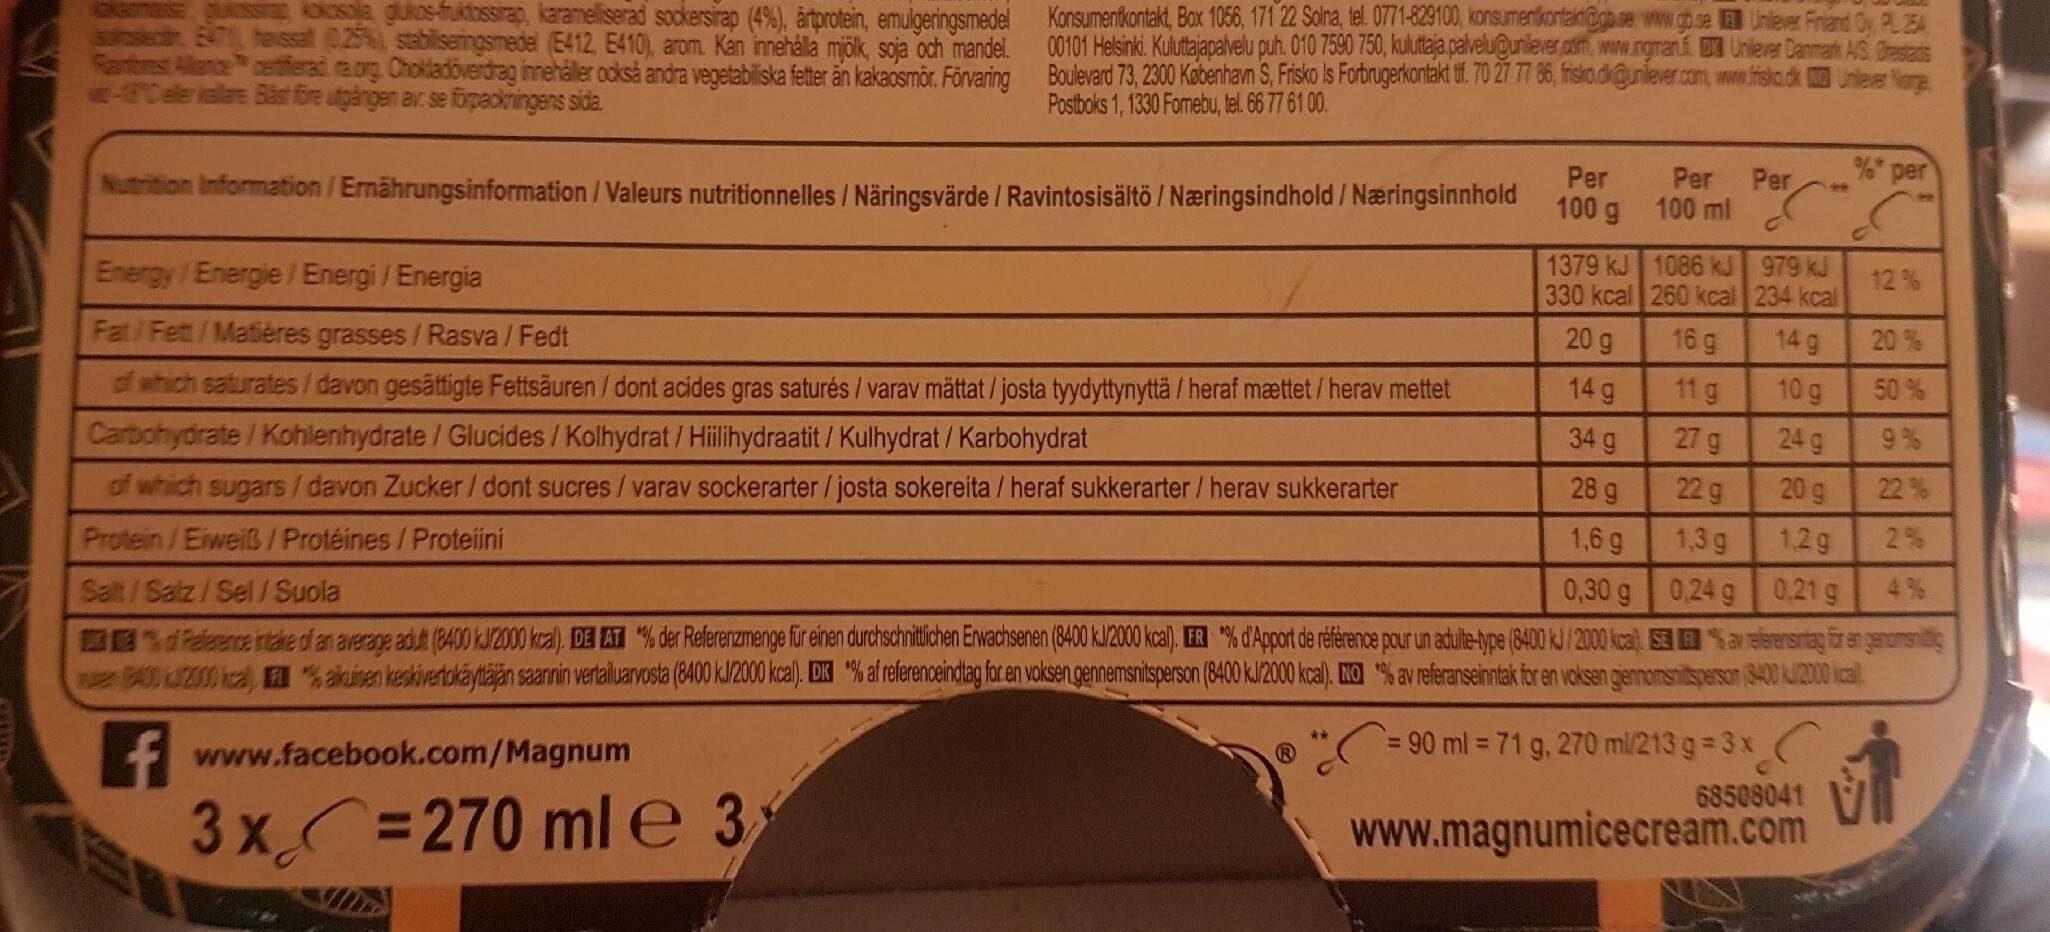 Magnum Vegan Sea Salt Caramel - Nutrition facts - en